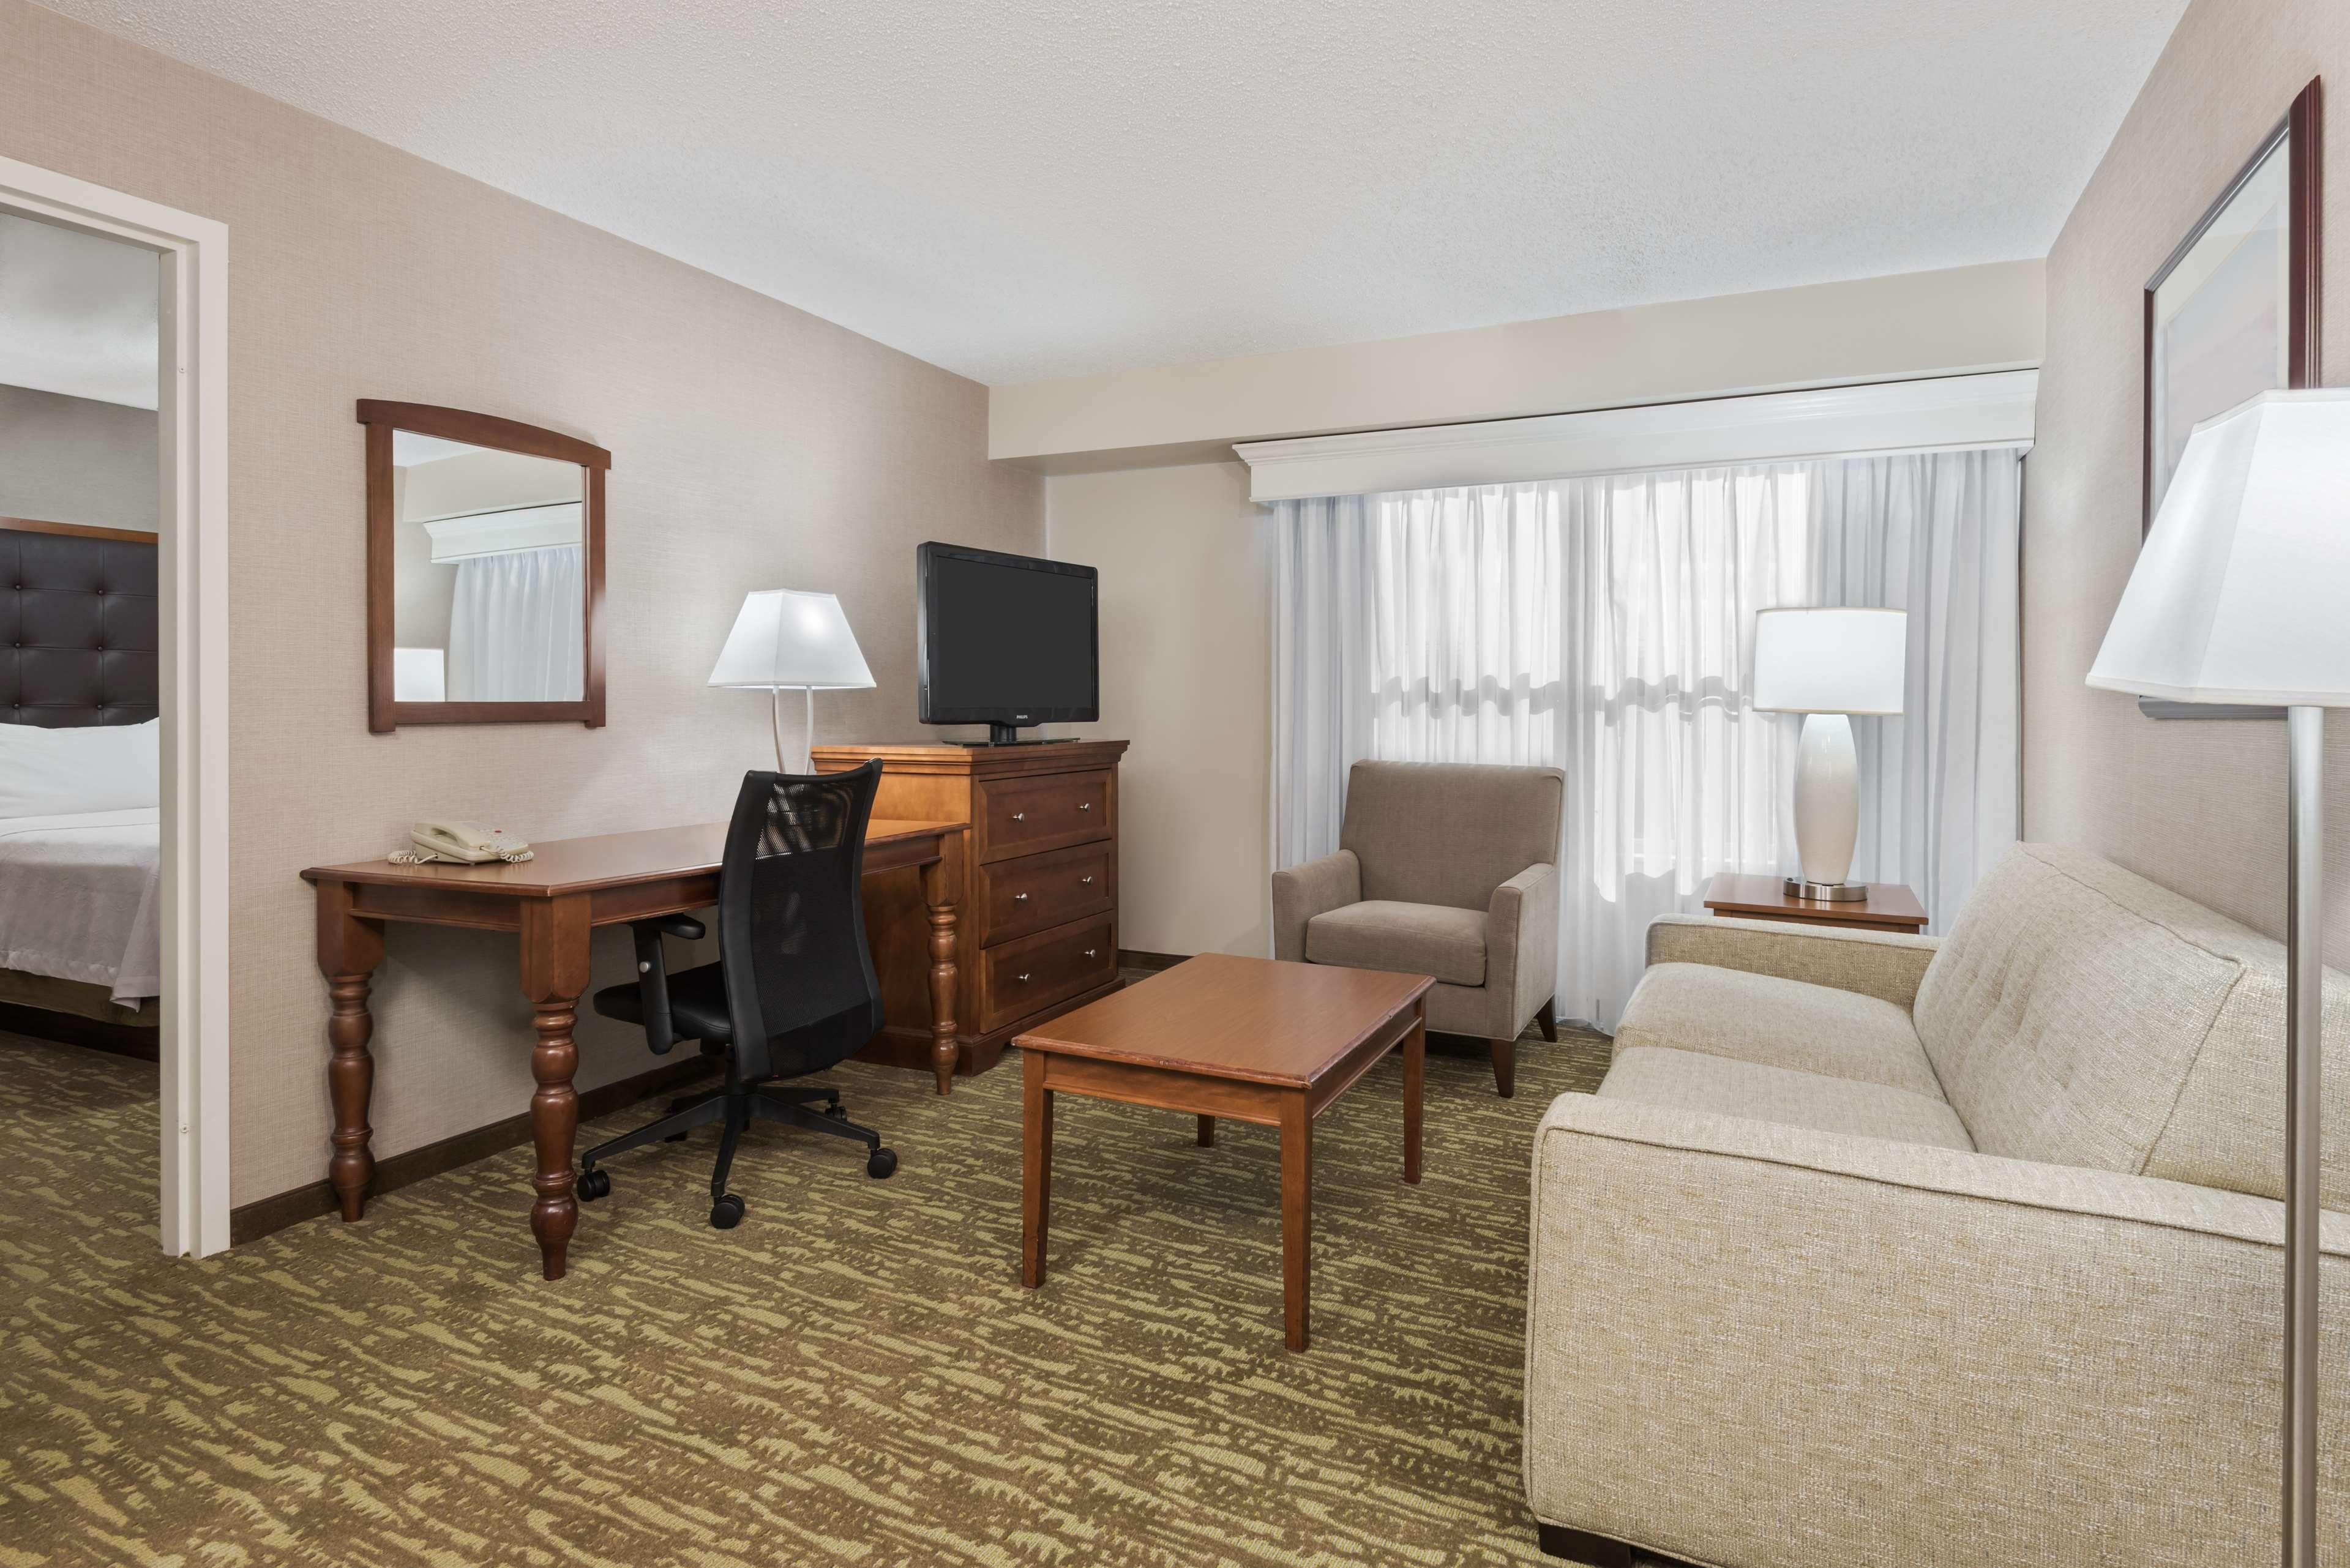 Homewood Suites by Hilton Holyoke-Springfield/North image 21